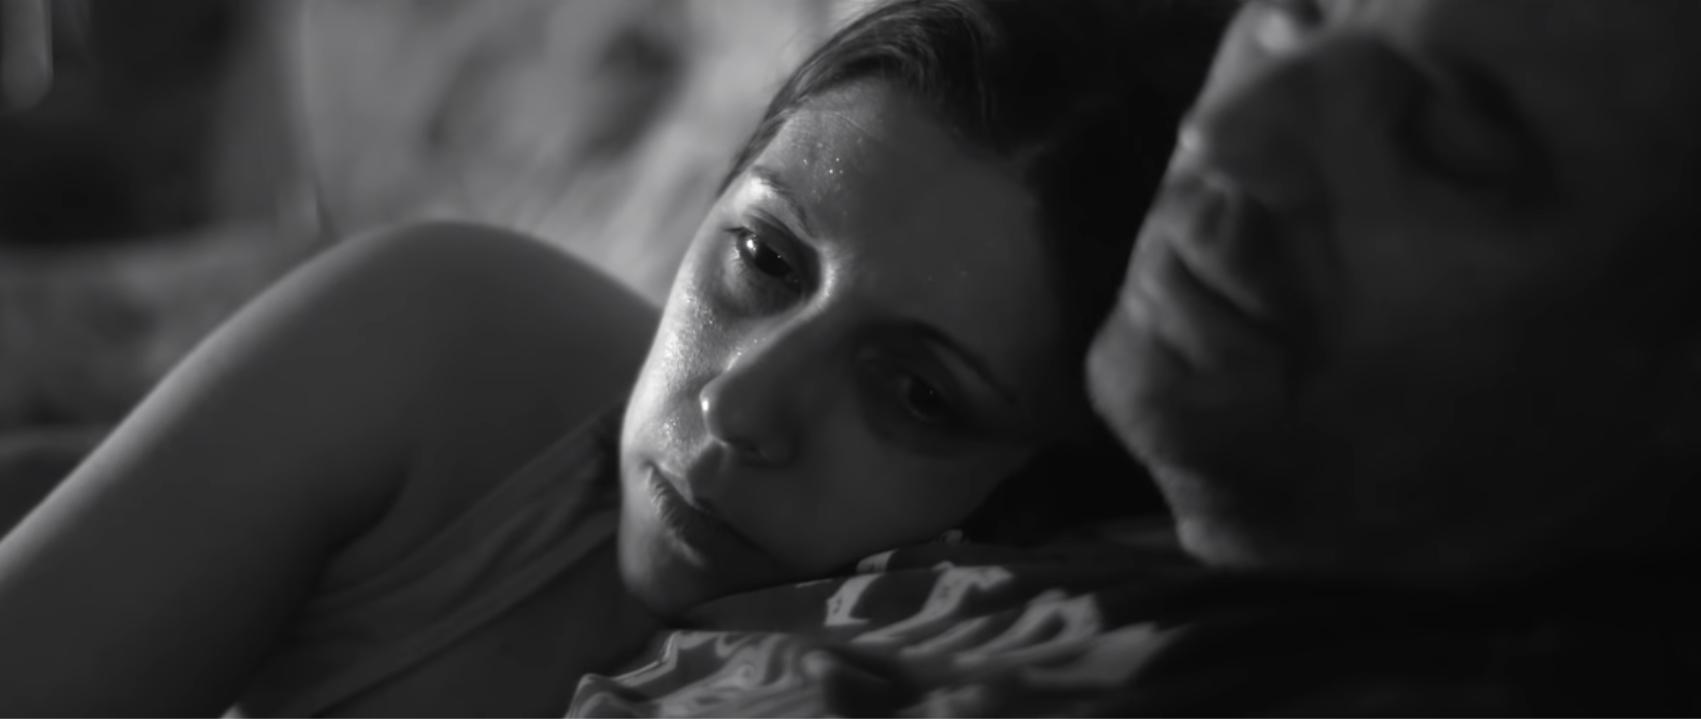 Pur Laine (feature film) Dir. Alexander Cruz; Production Manager Emily Ramsay